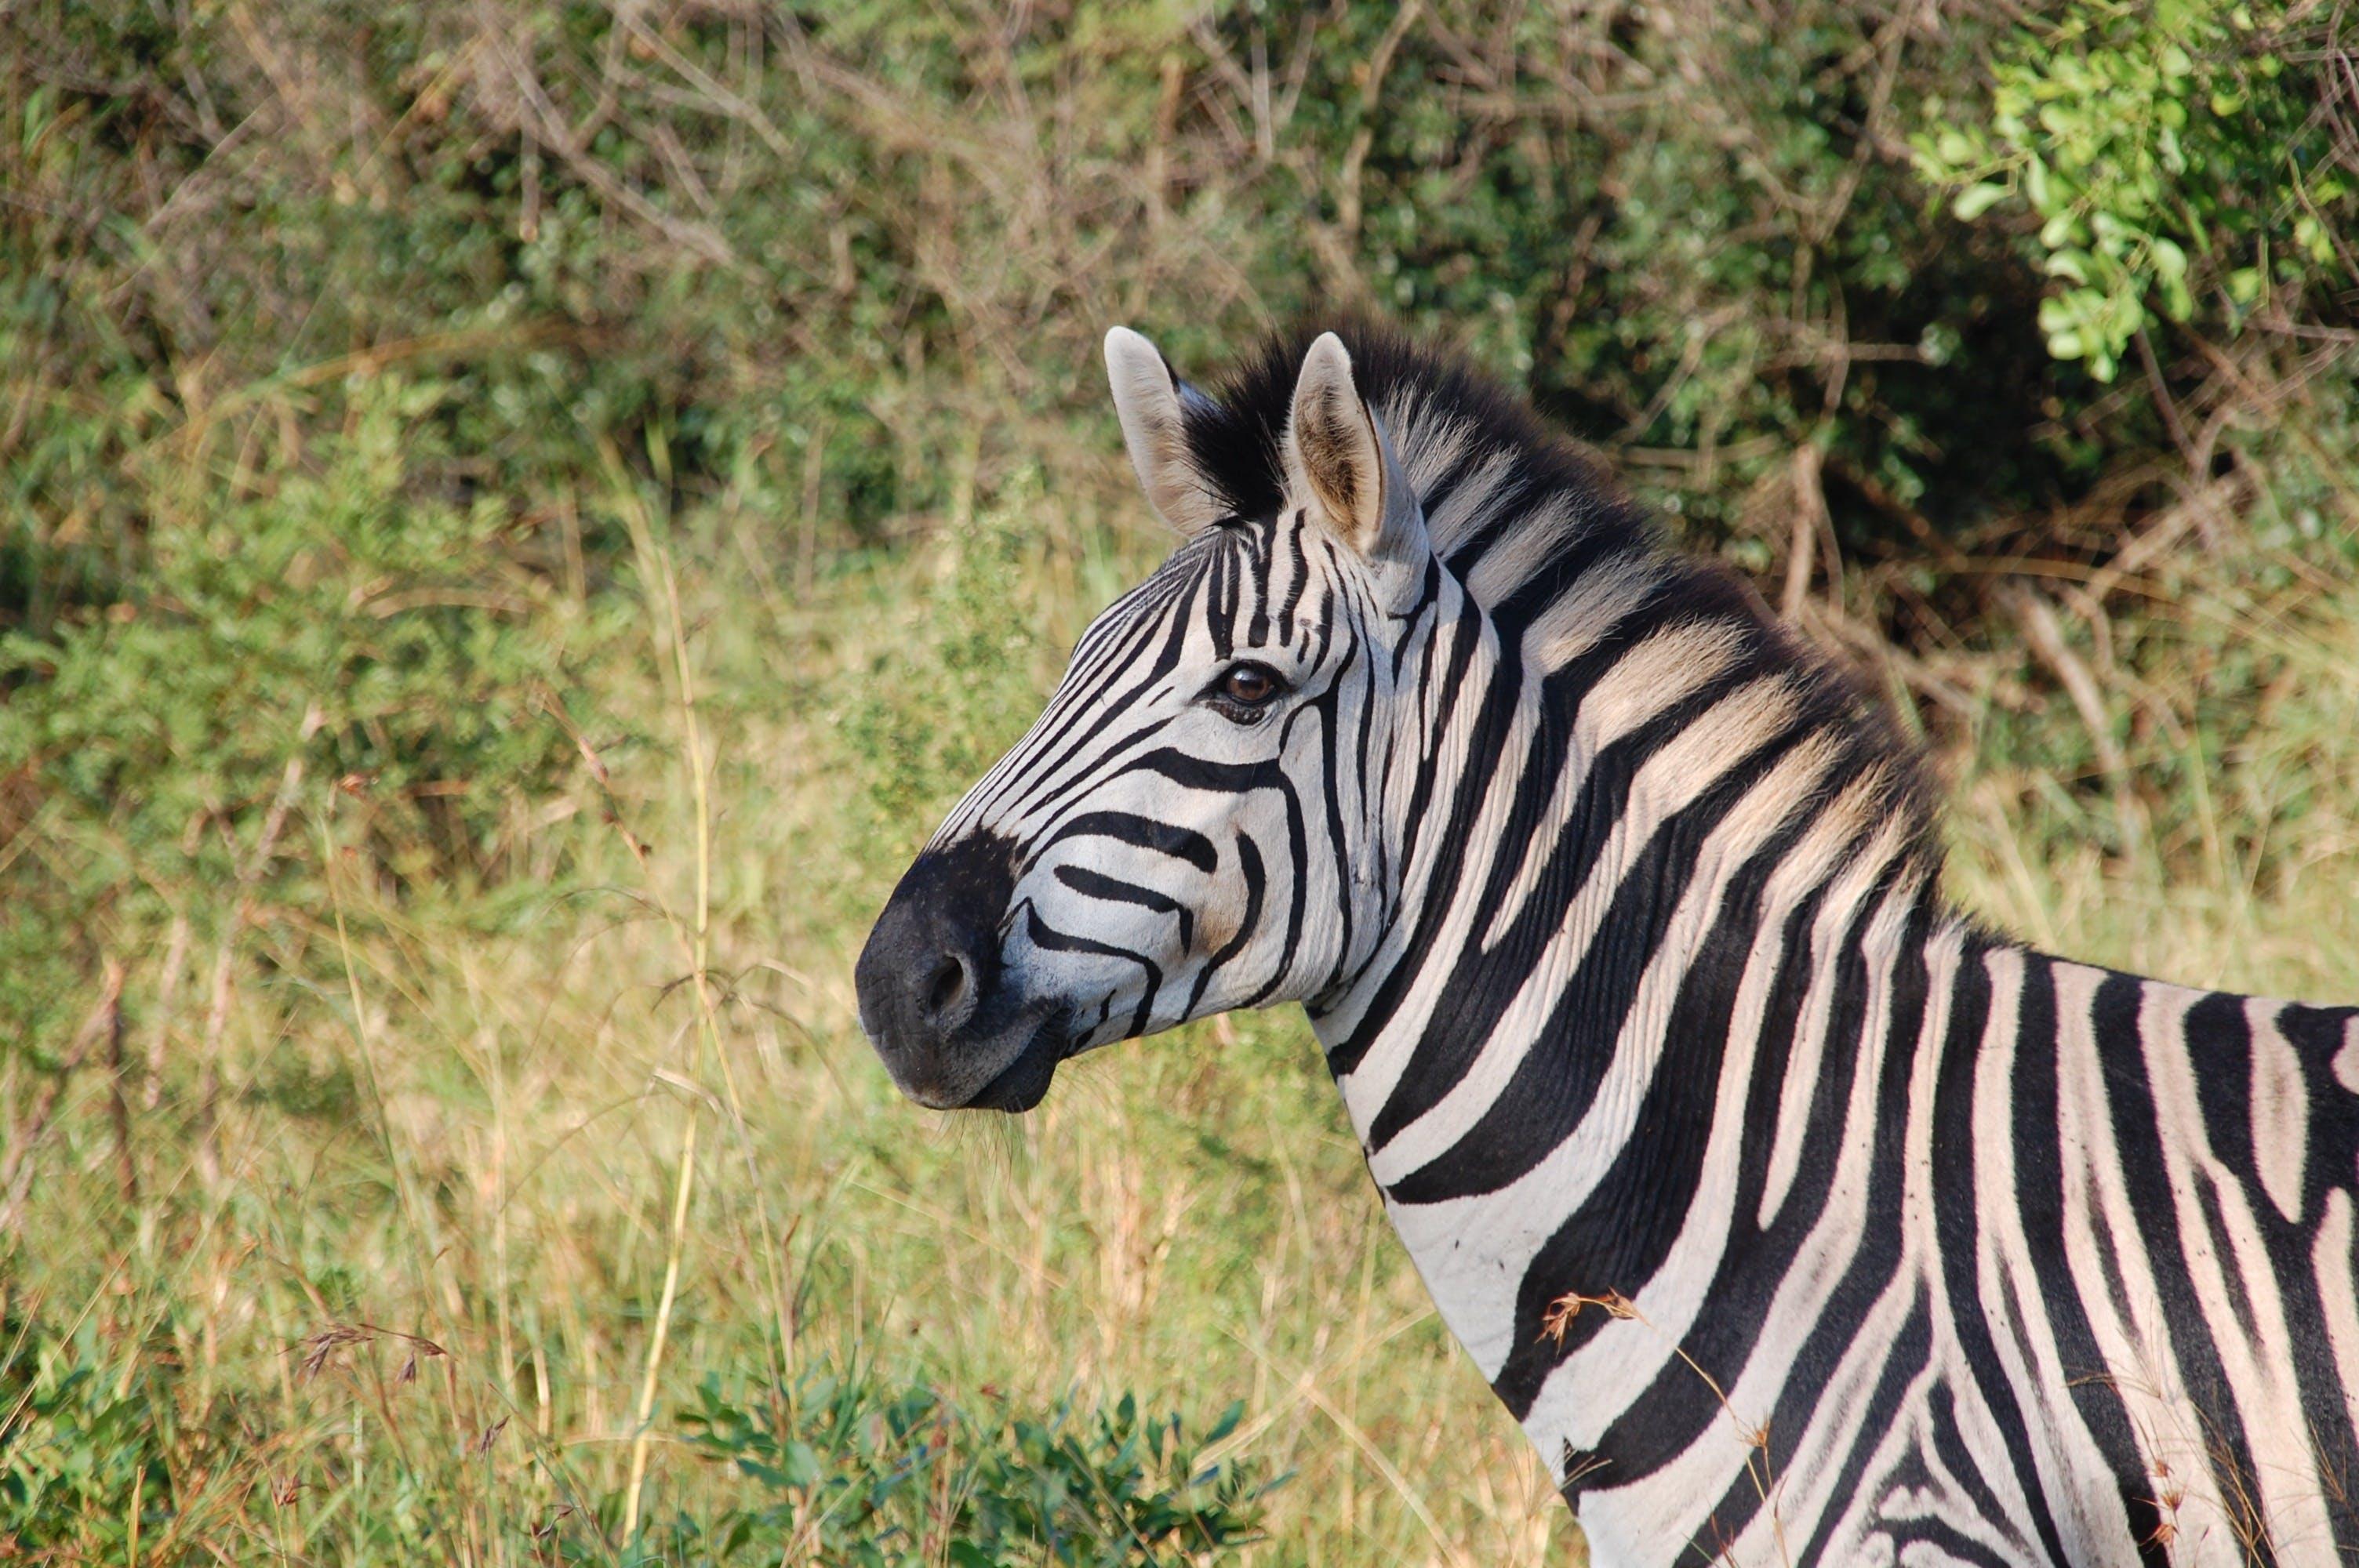 Zebra Near Green Plants